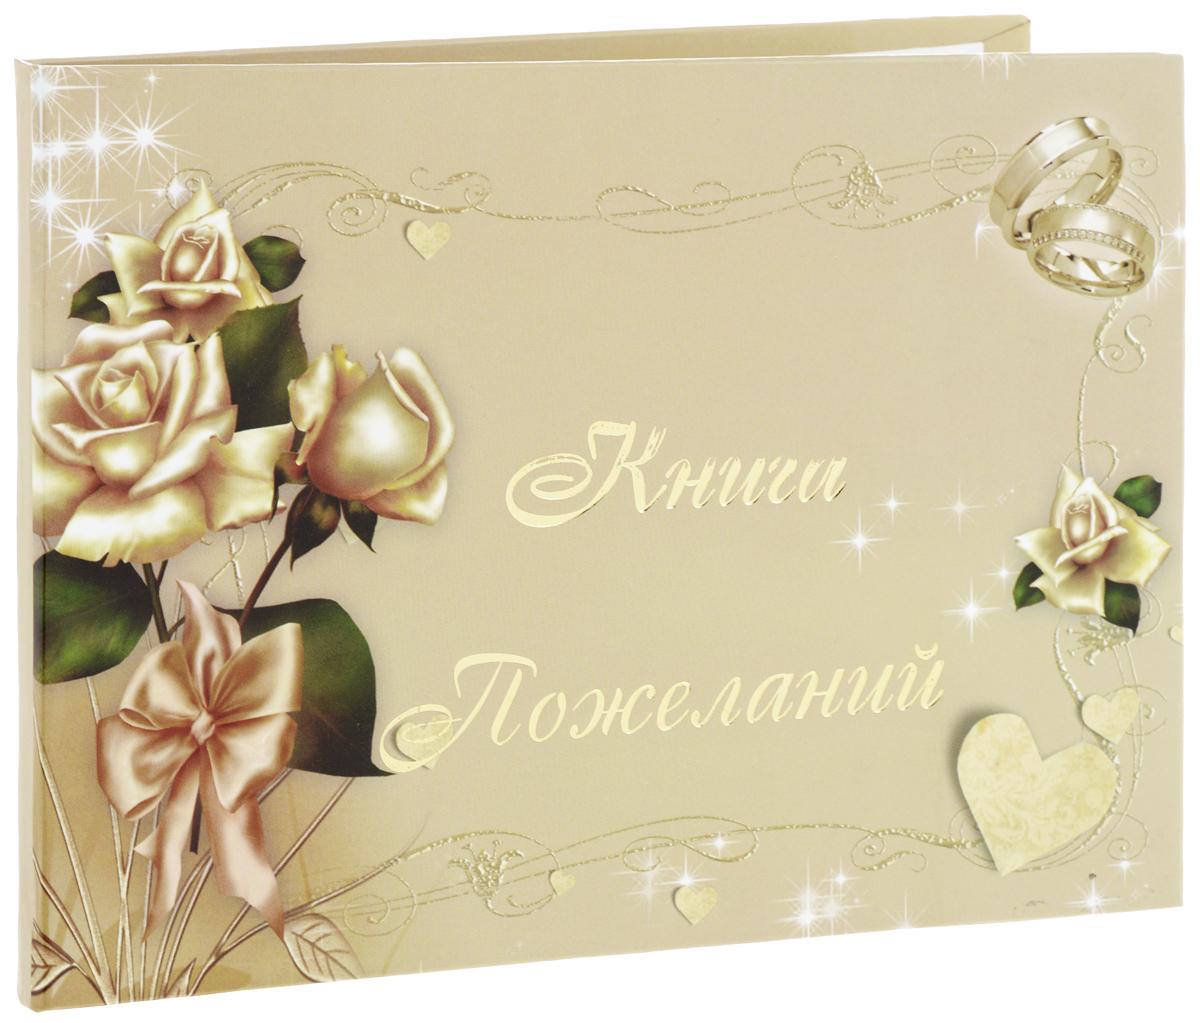 Книга пожеланий на свадьбу Принт Торг